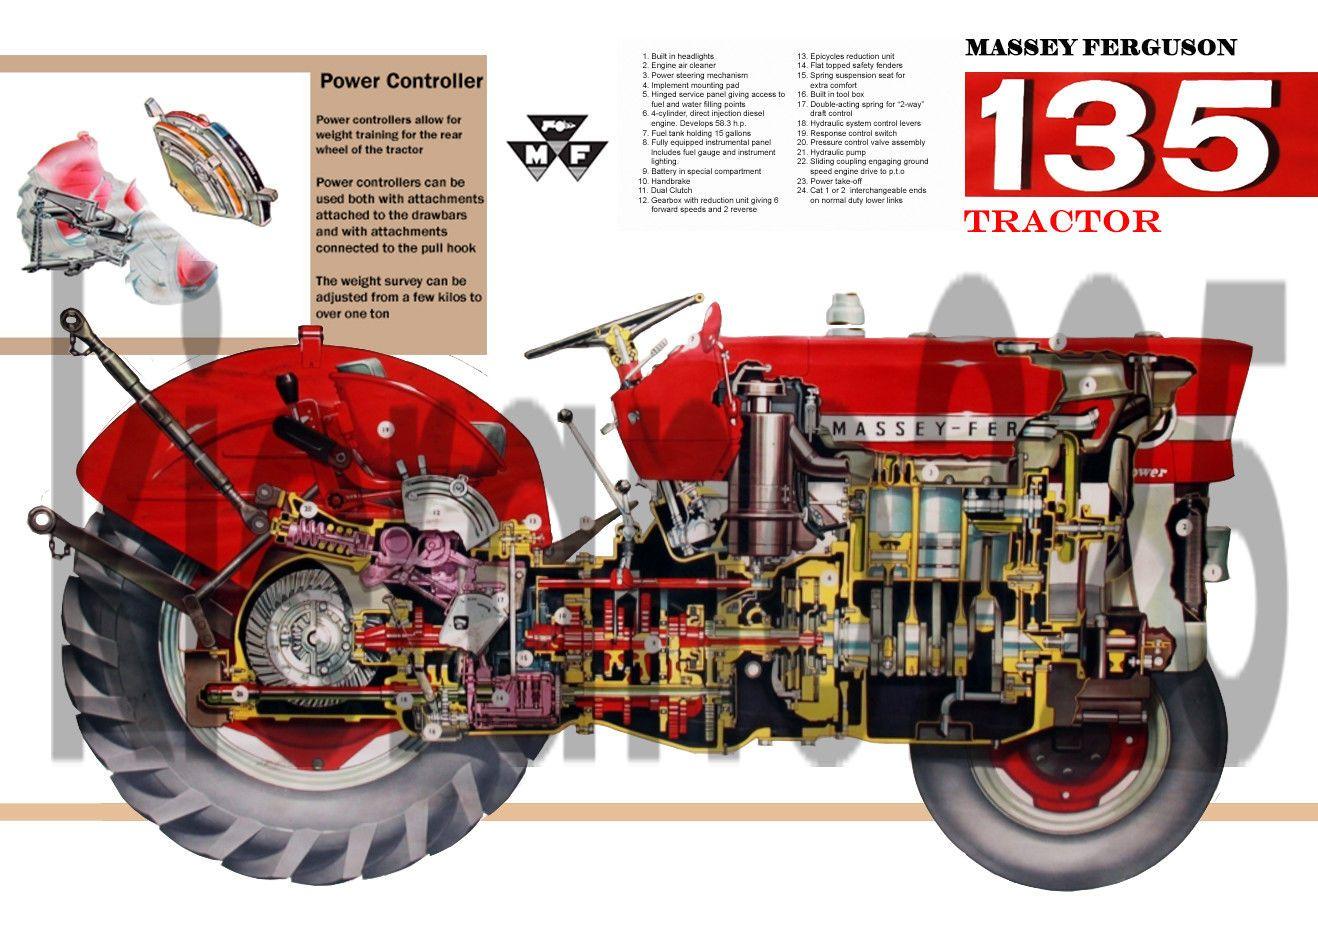 Details about Vintage Massey Ferguson Tractor 135 150 165 Poster